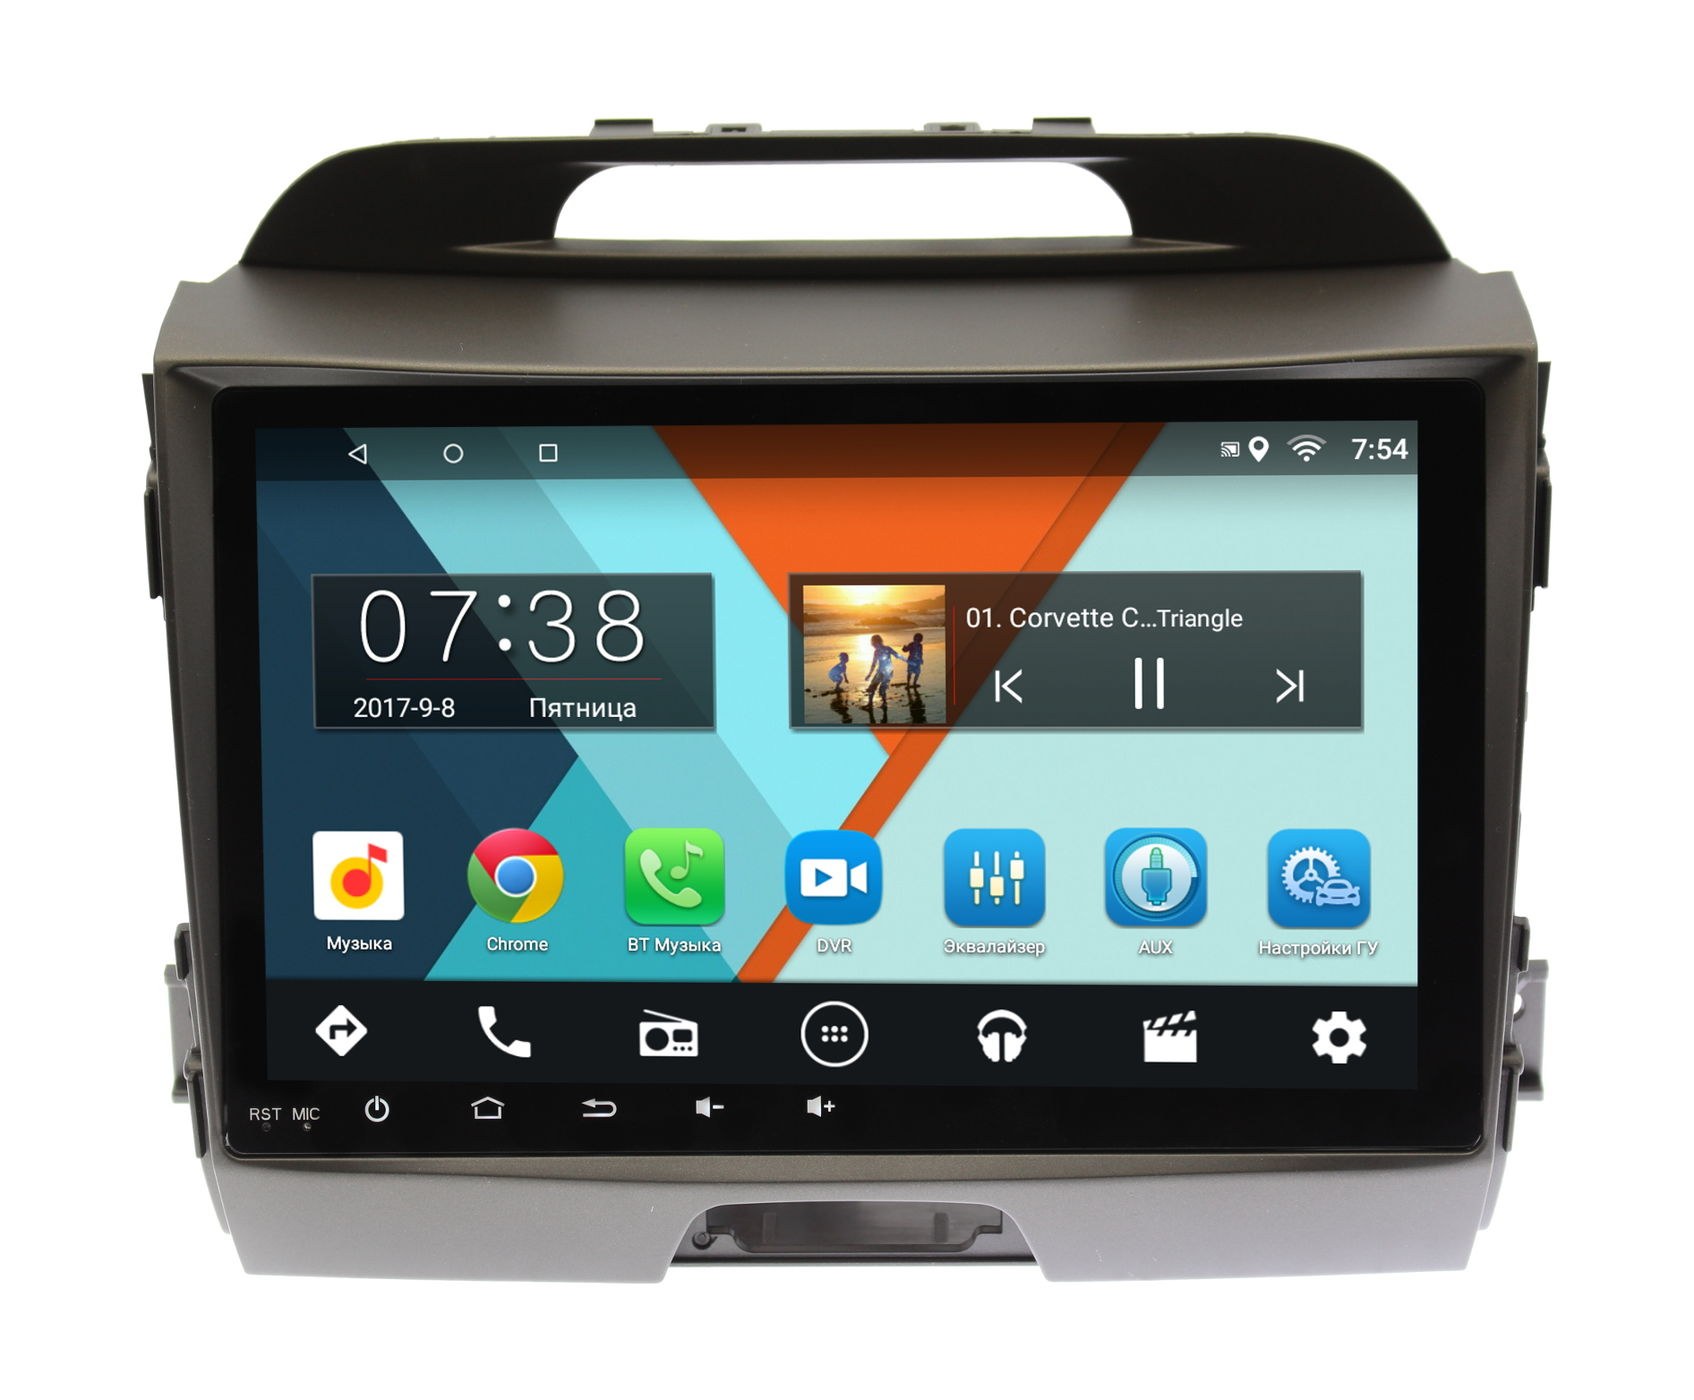 Фото - Штатная магнитола Kia Sportage III 2010-2016 для авто с камерой Wide Media MT9072MF-1/16 на Android 6.0.1 авто